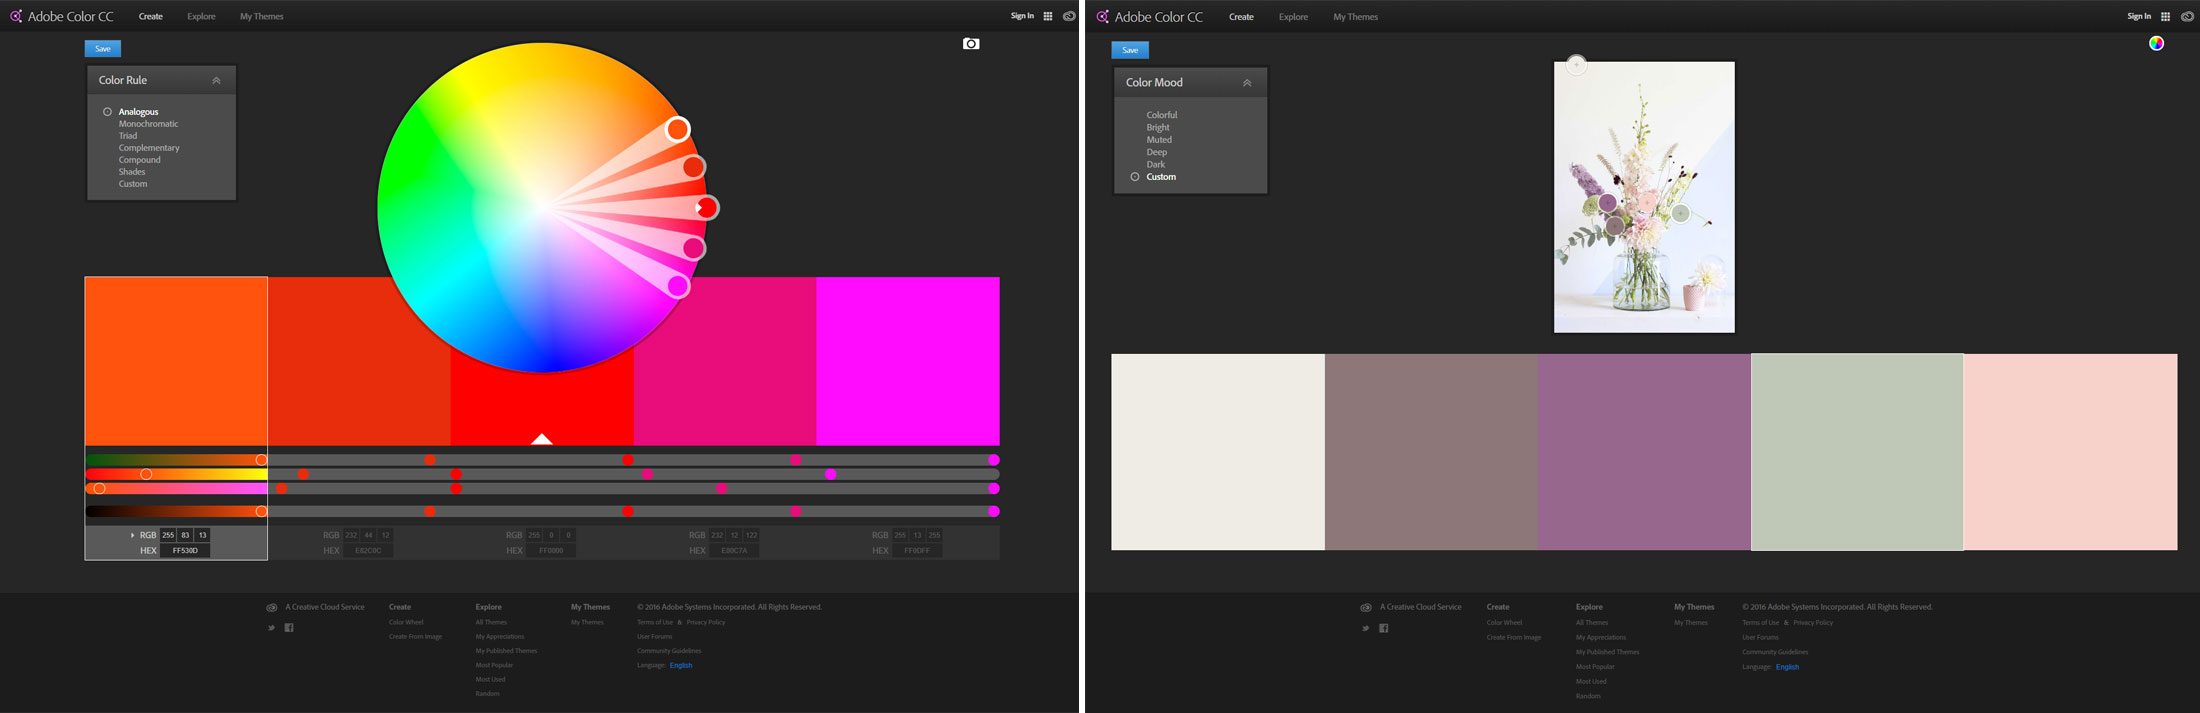 Adobe Colour CC